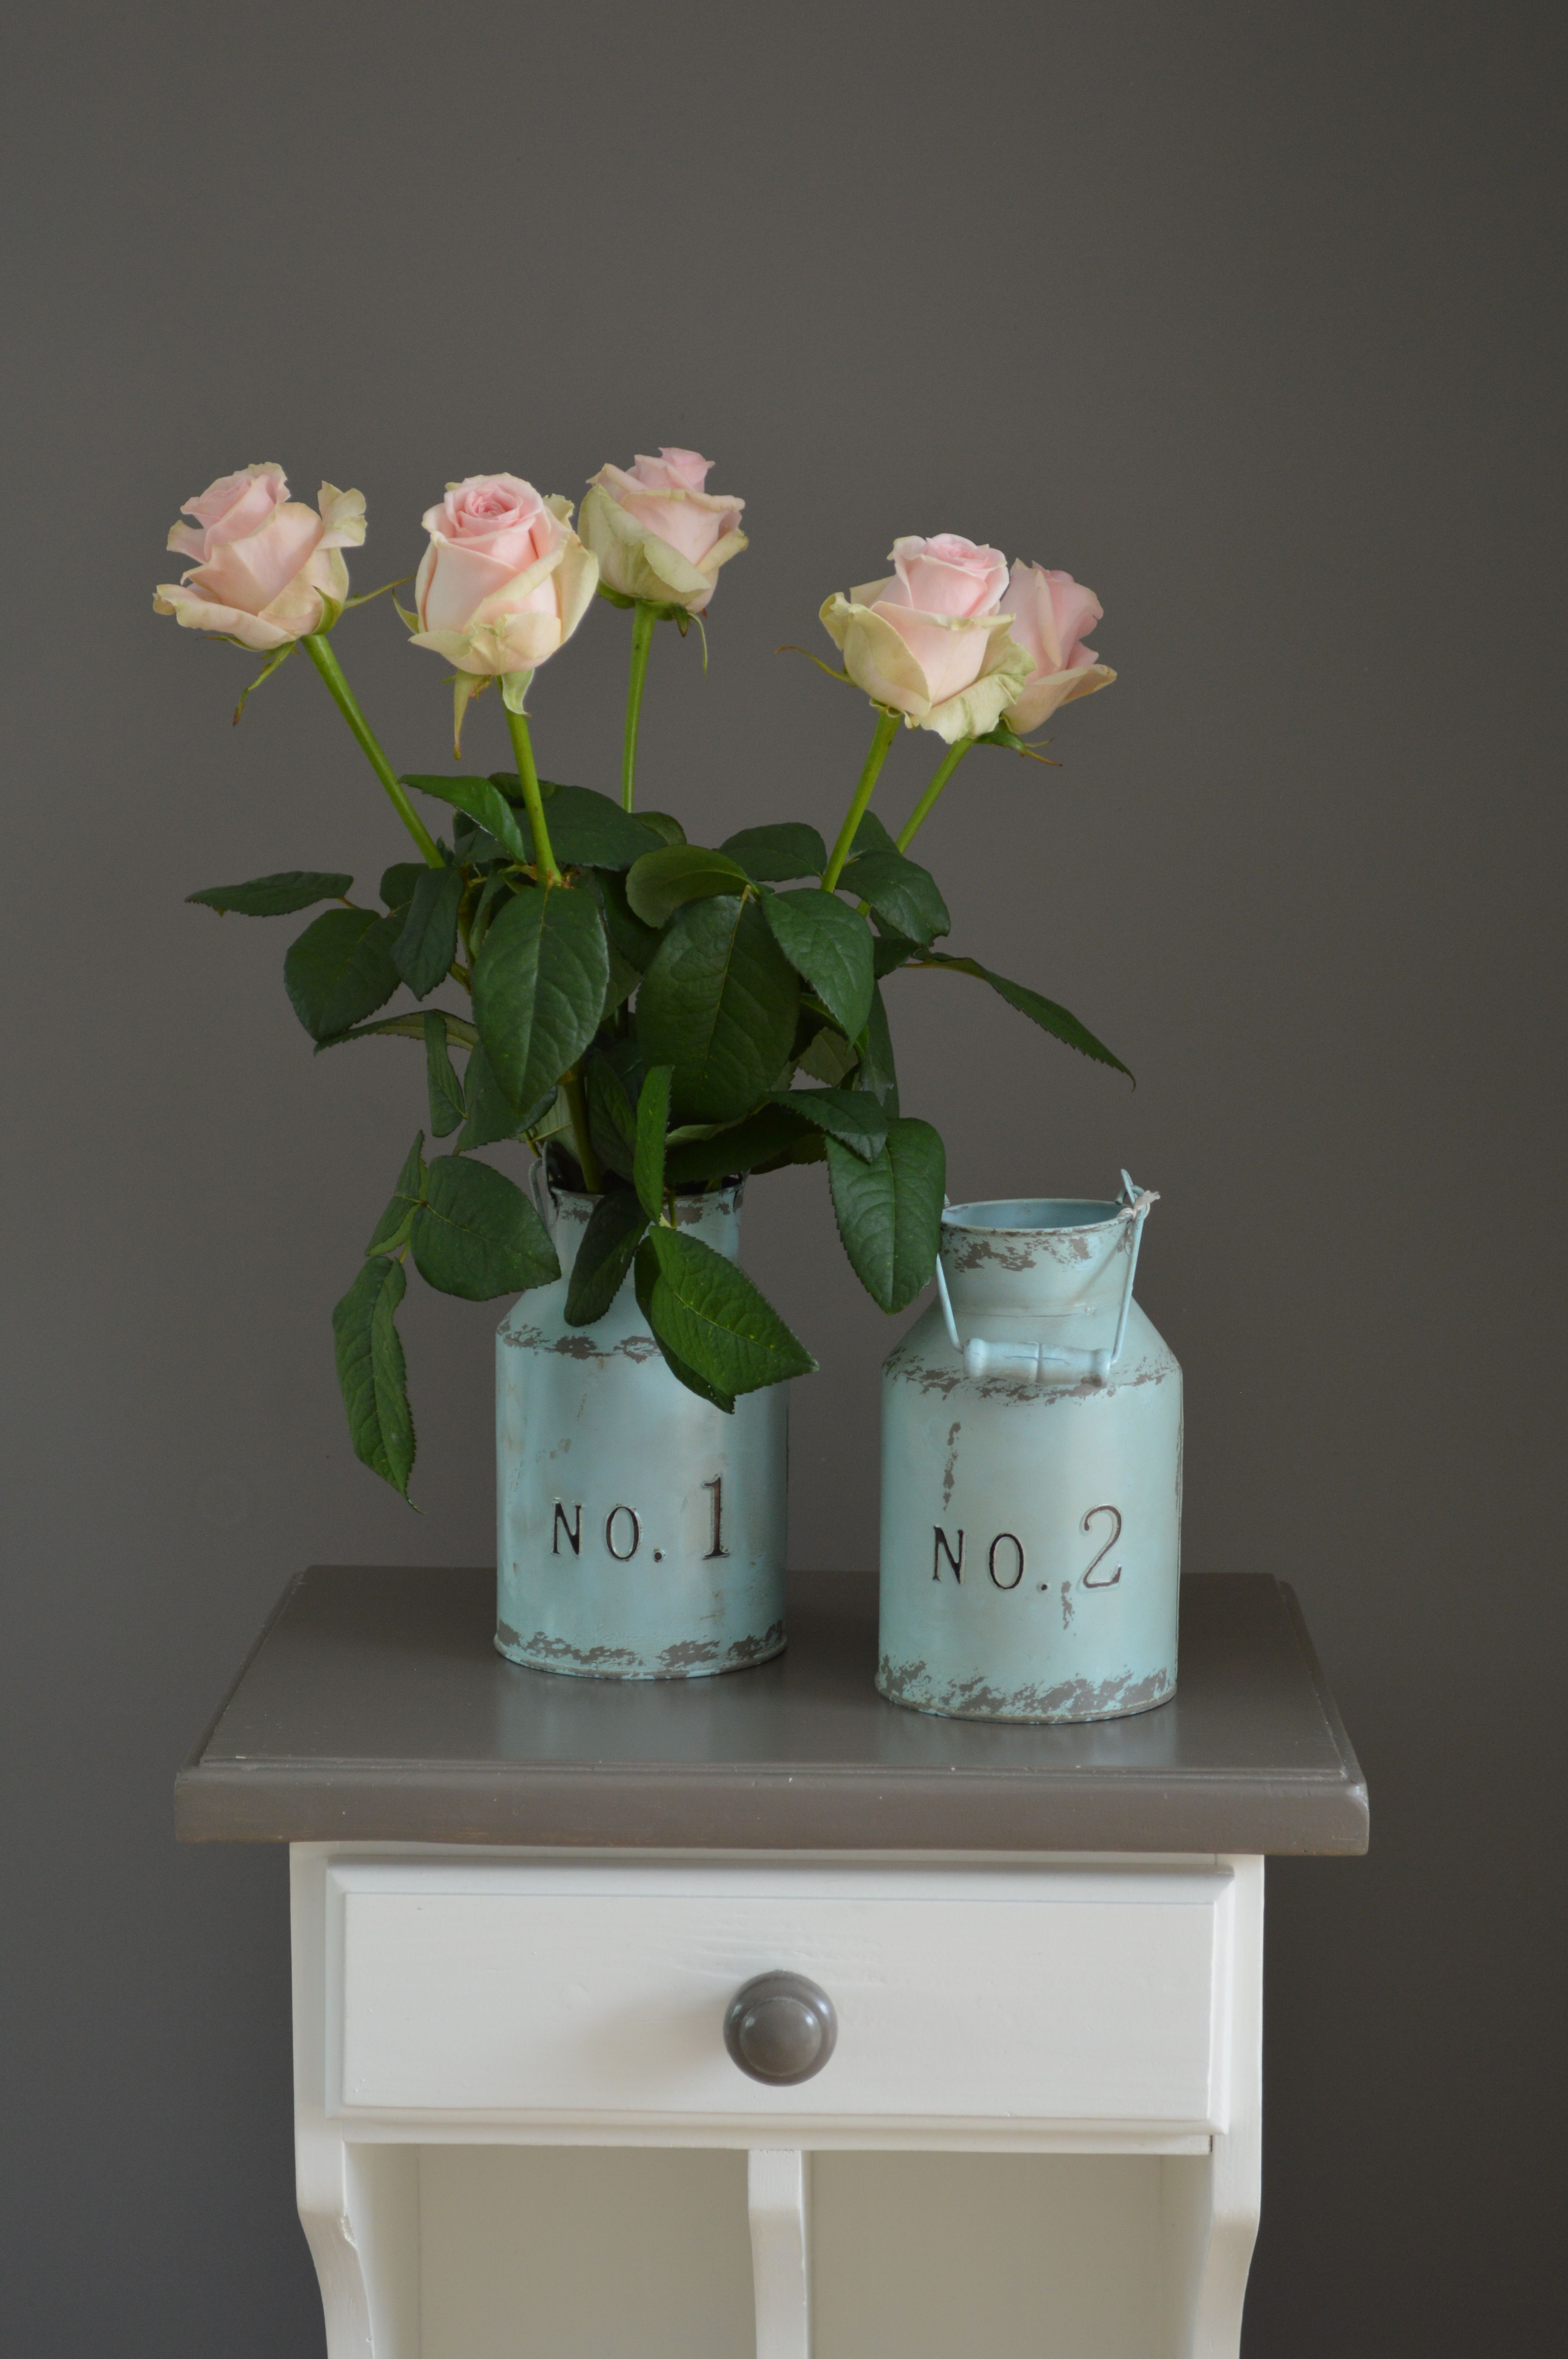 Sweet dolomiti van Marjoland in mijn interieur.   Roses for every ...